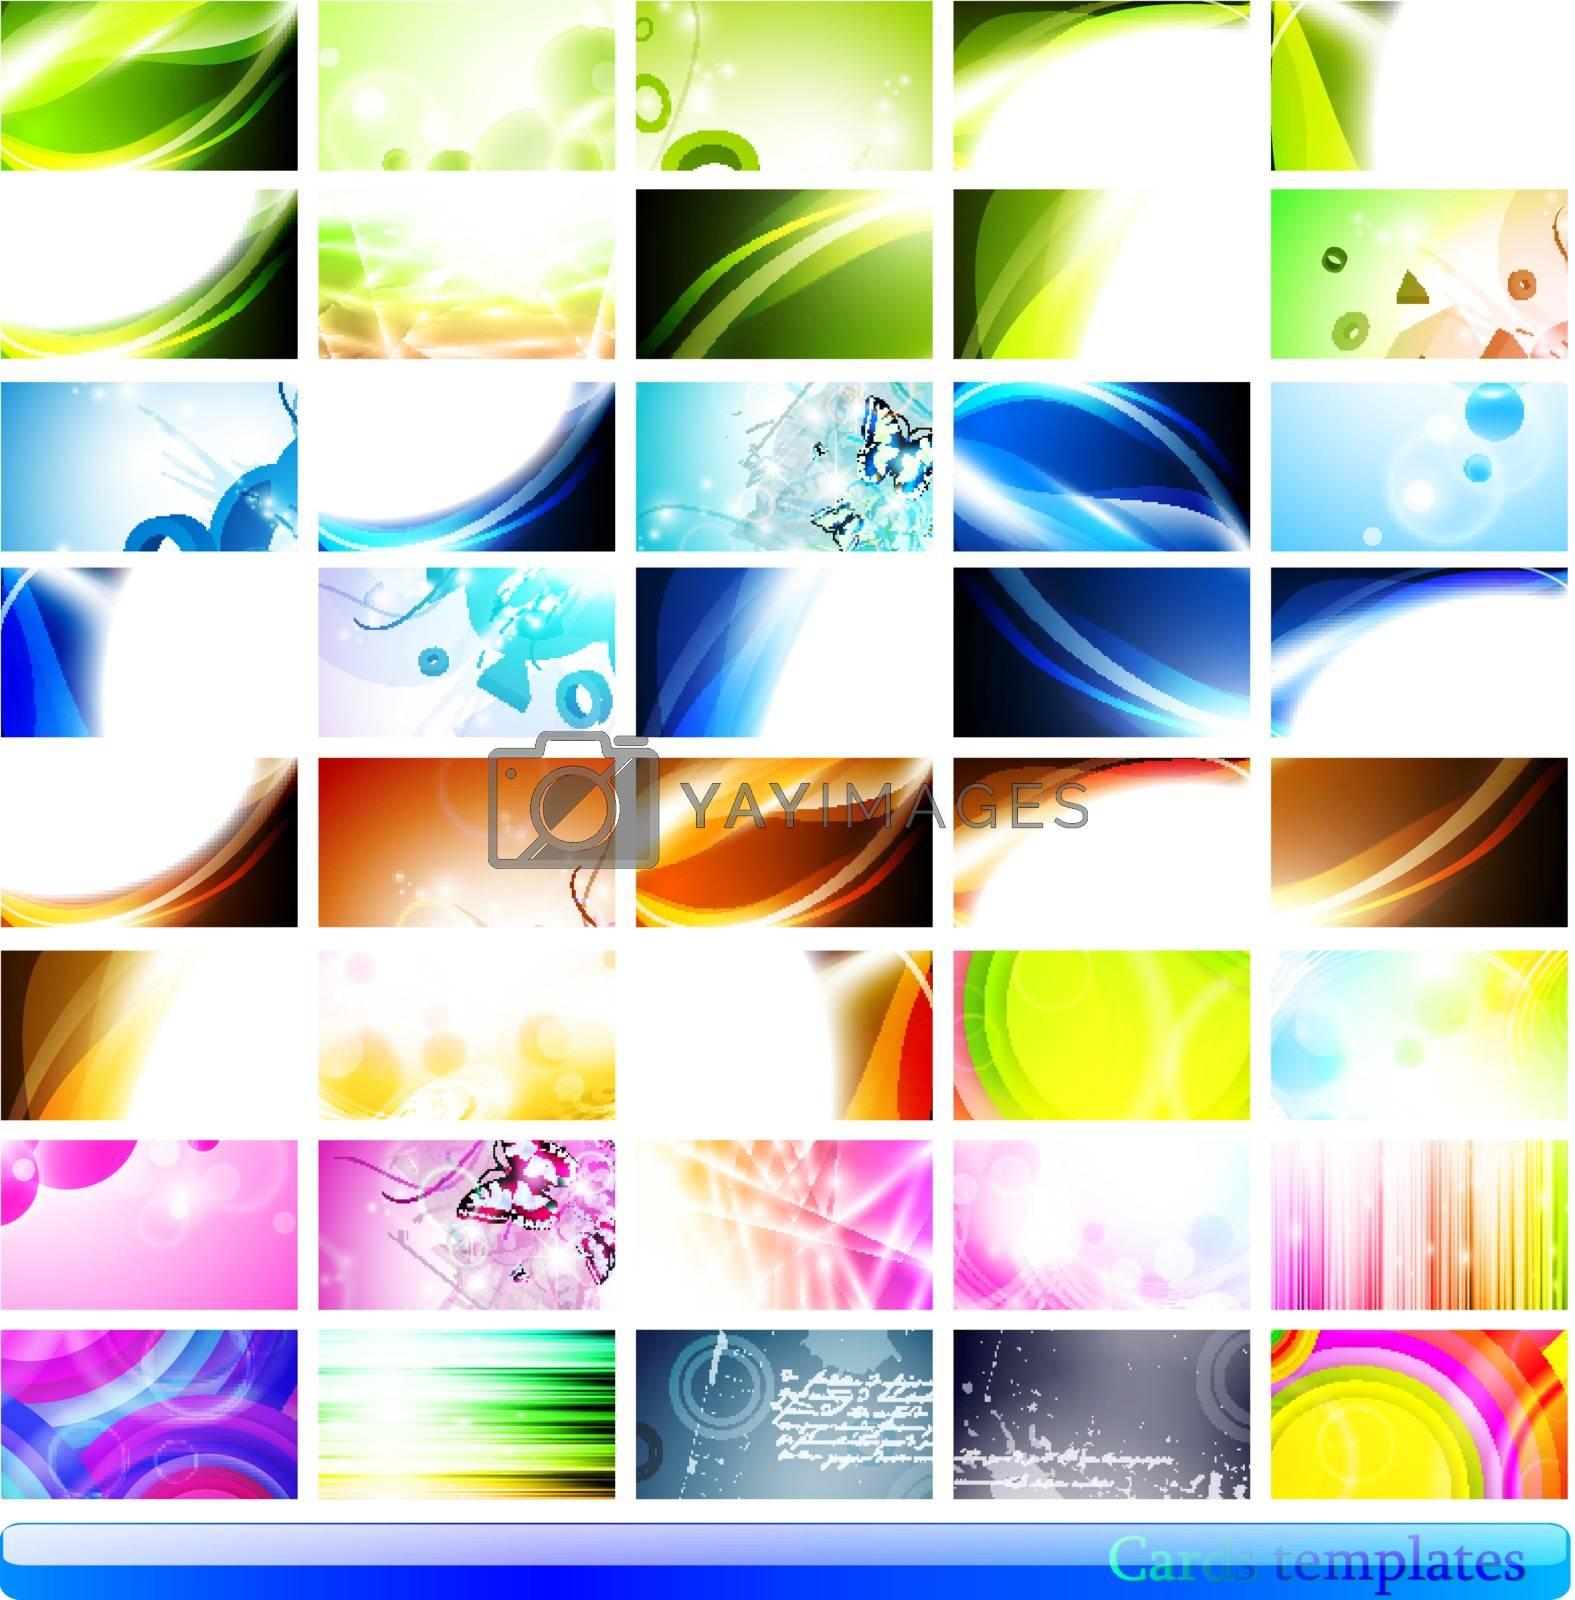 Royalty free image of business cards templates  by razvodovska